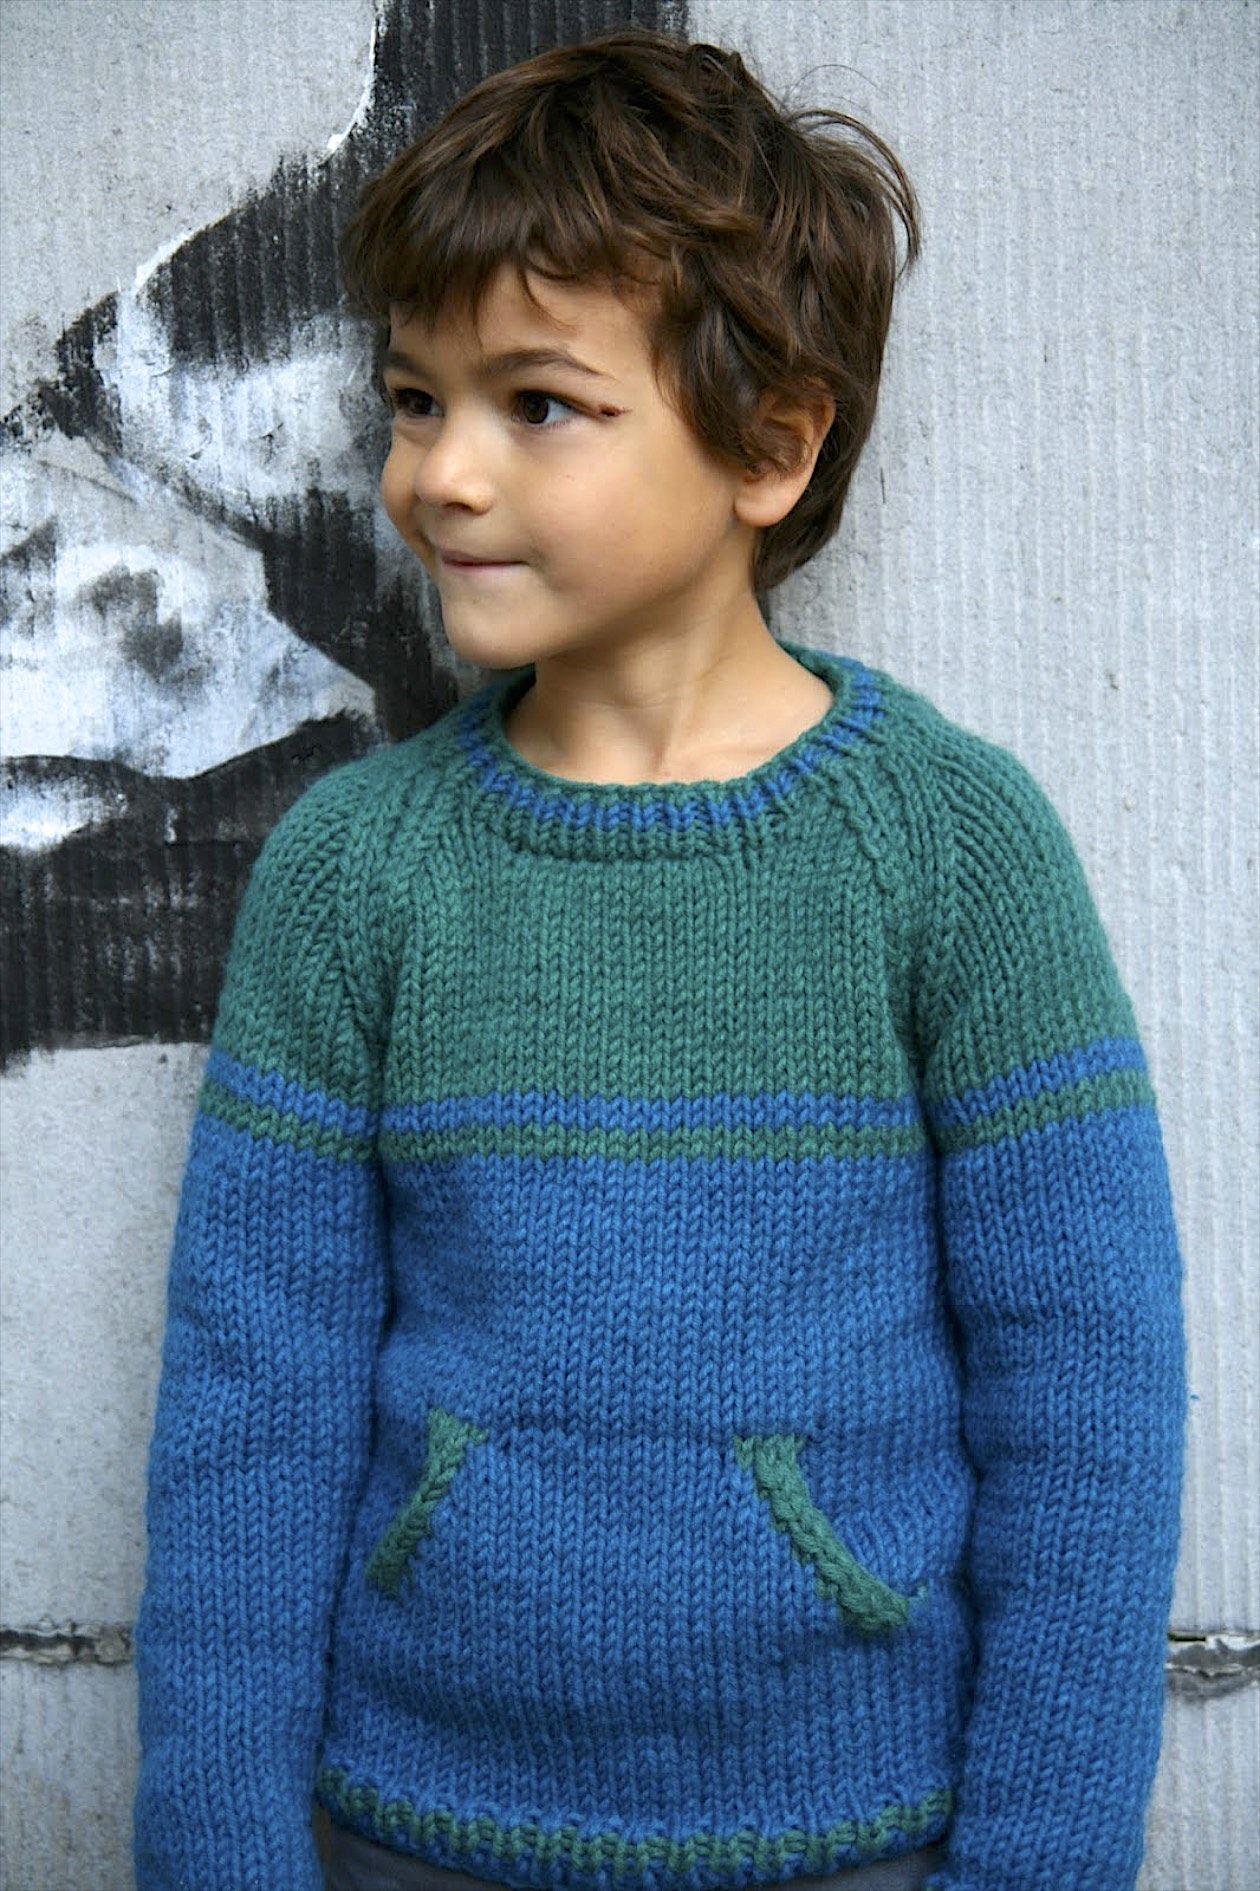 Quokka sweater blogtour #4 | Sweaters, Sweater pattern, Quokka